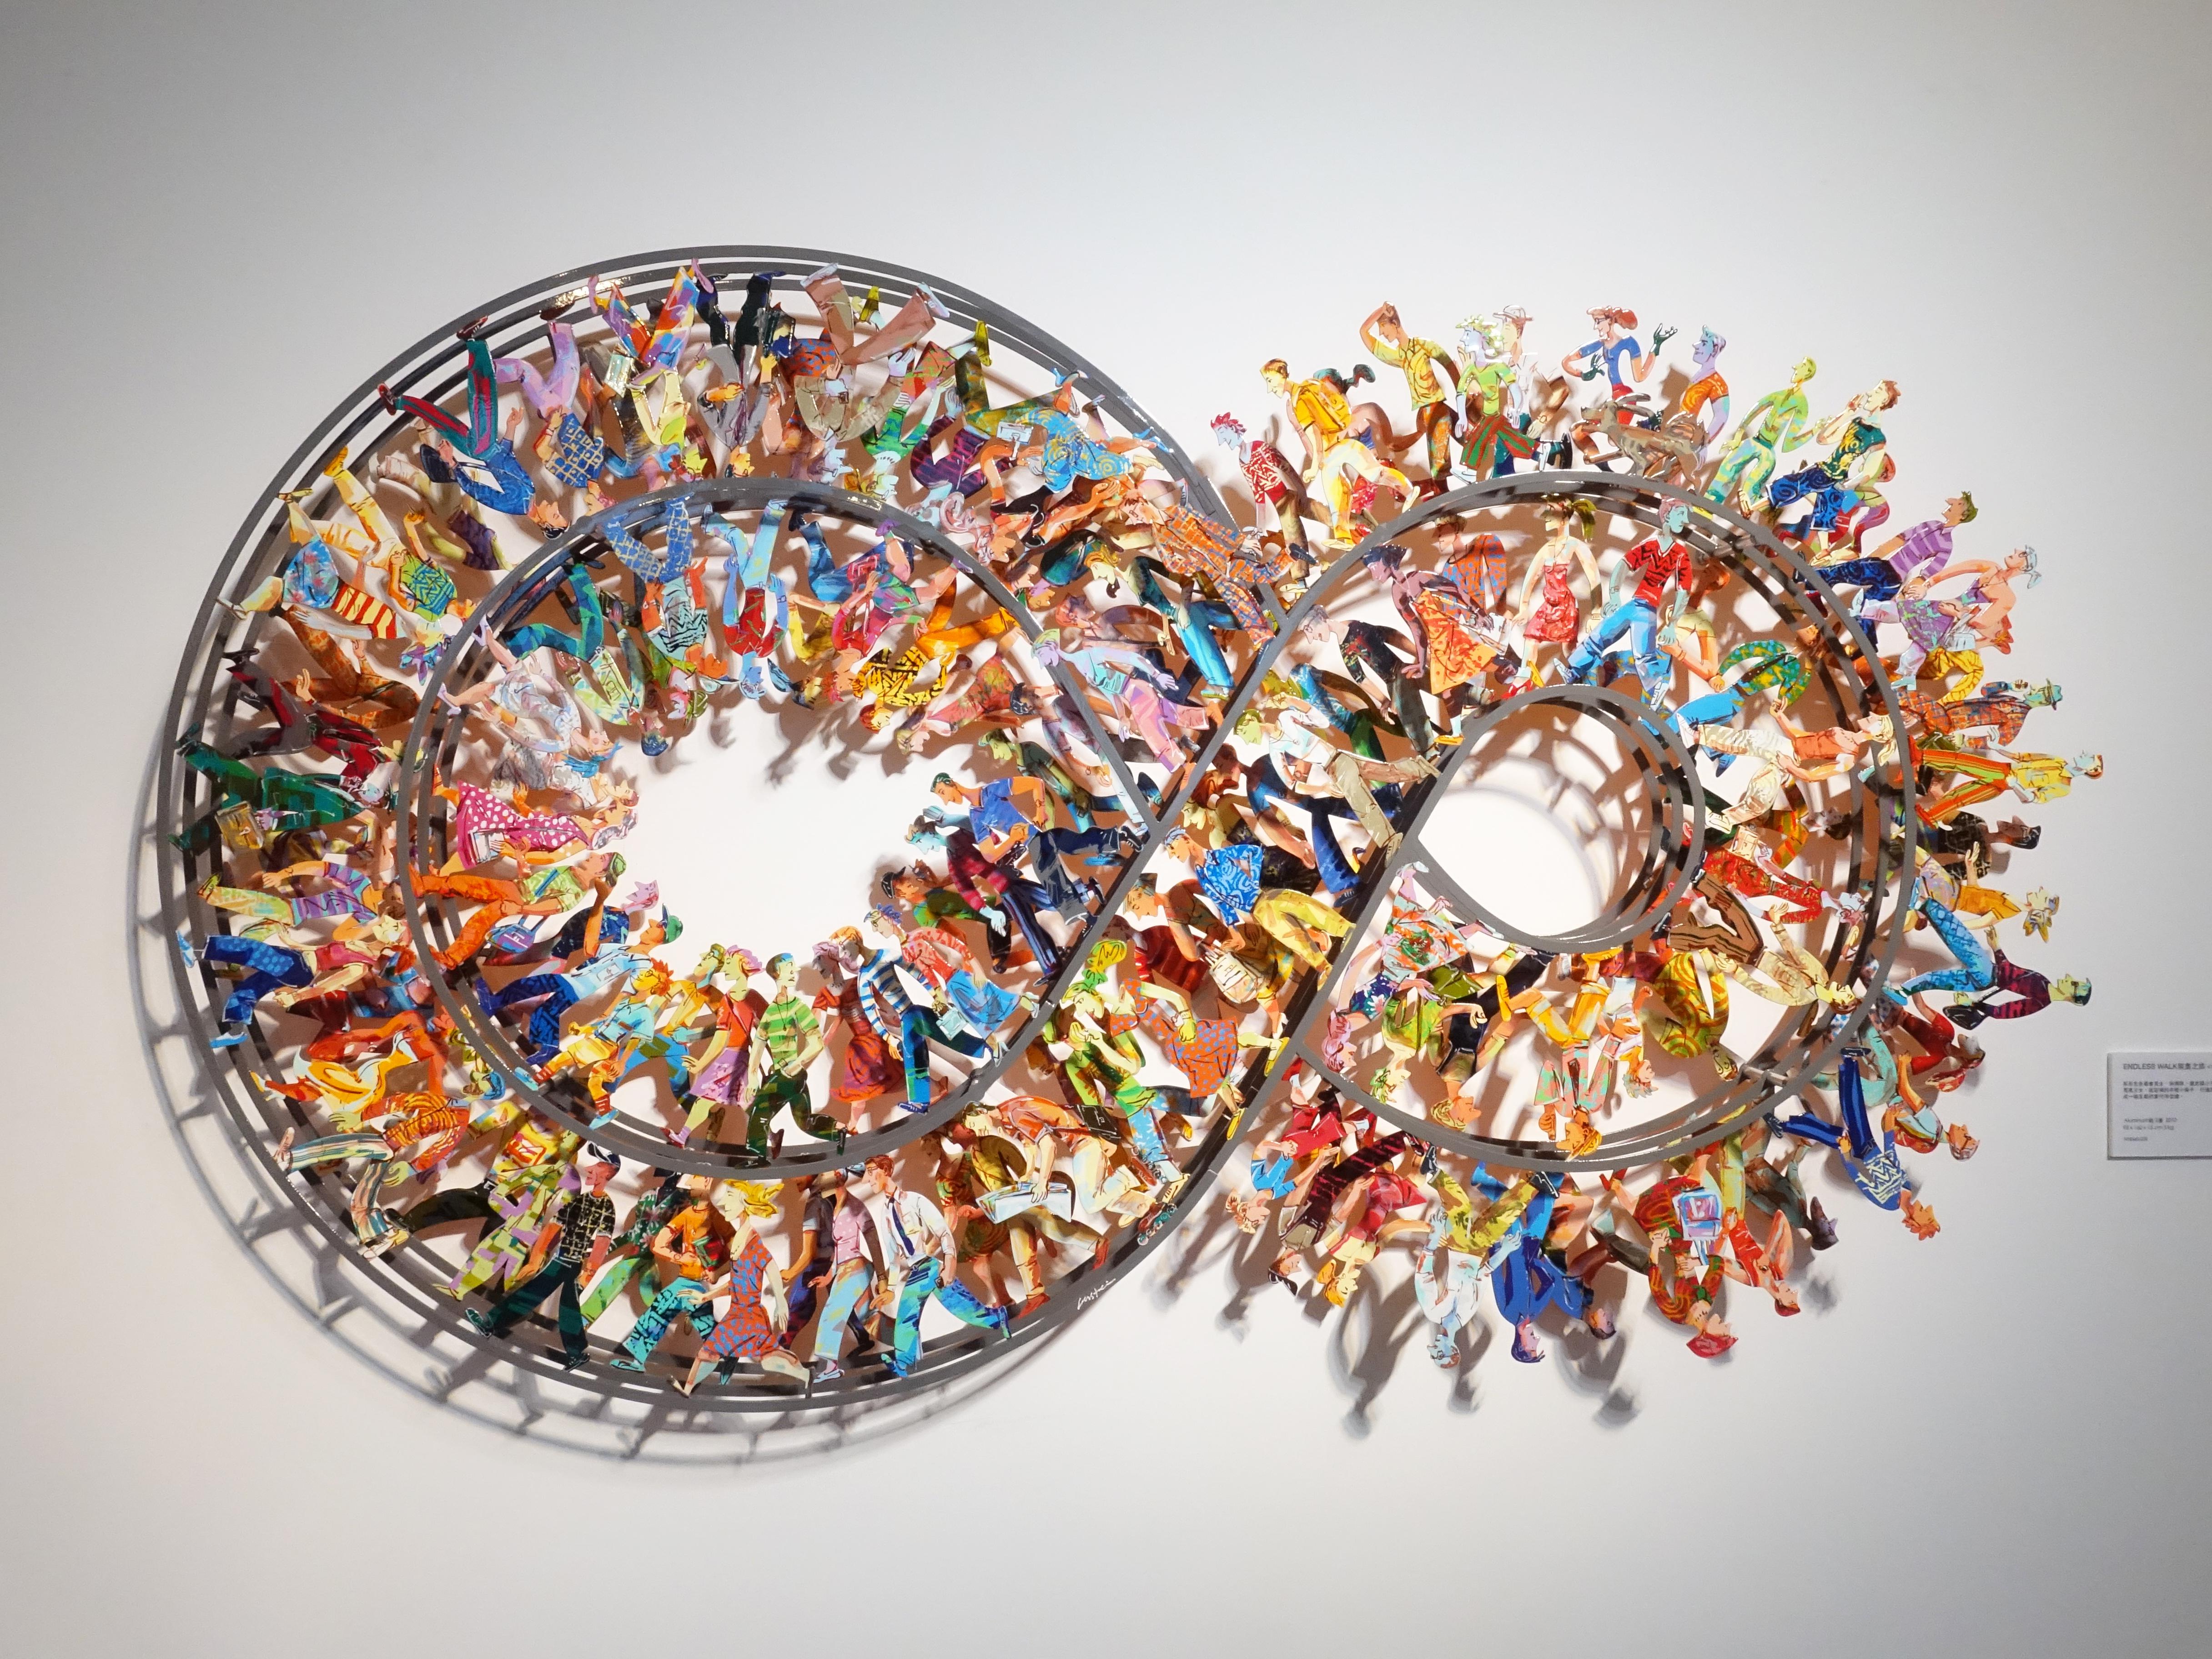 David Gerstein,《Endless Walk》,95 x 160 x 15 cm,Aluminum鋁3層,2010。